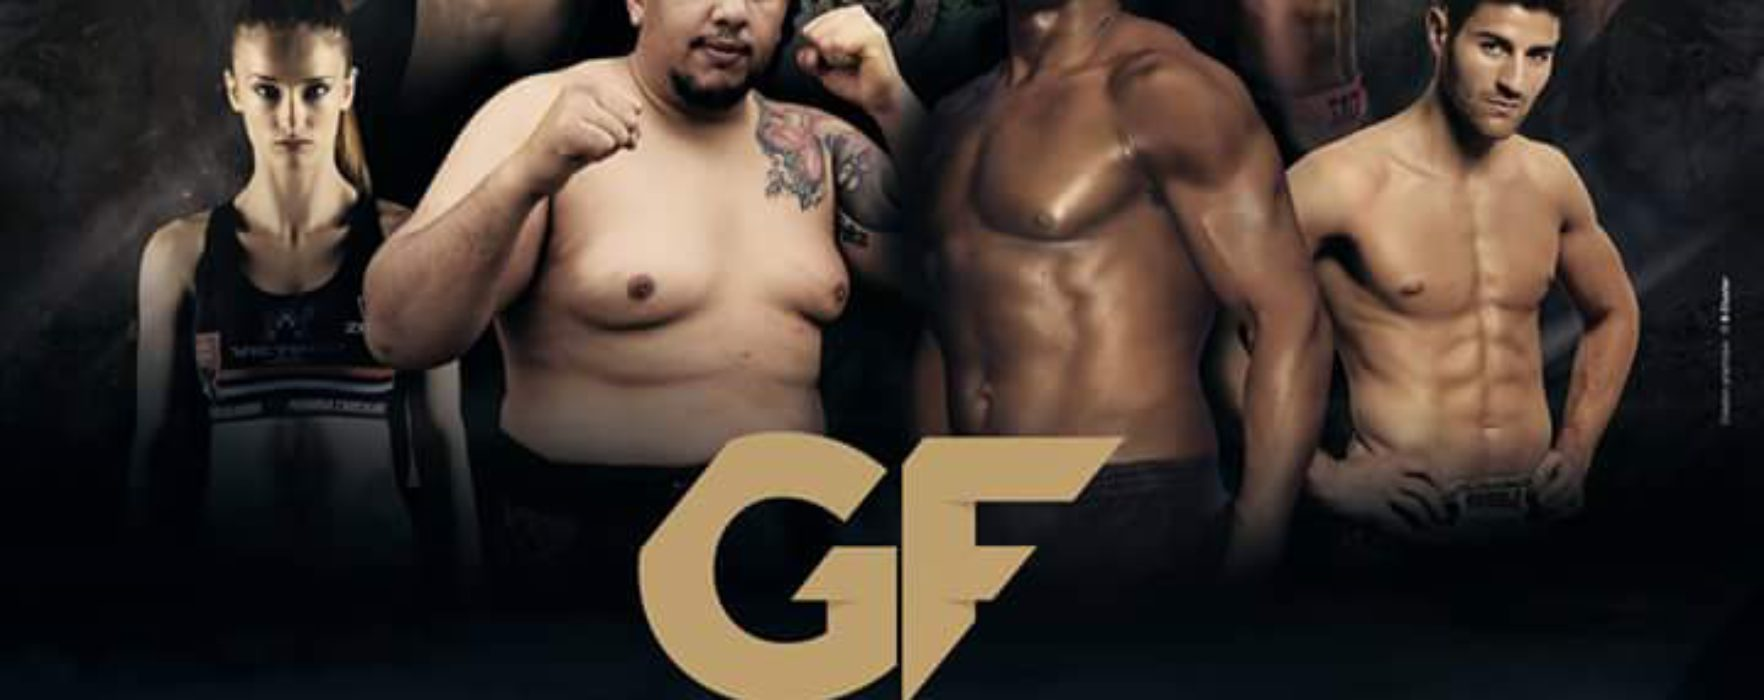 Golden fight Dec 9, 2017